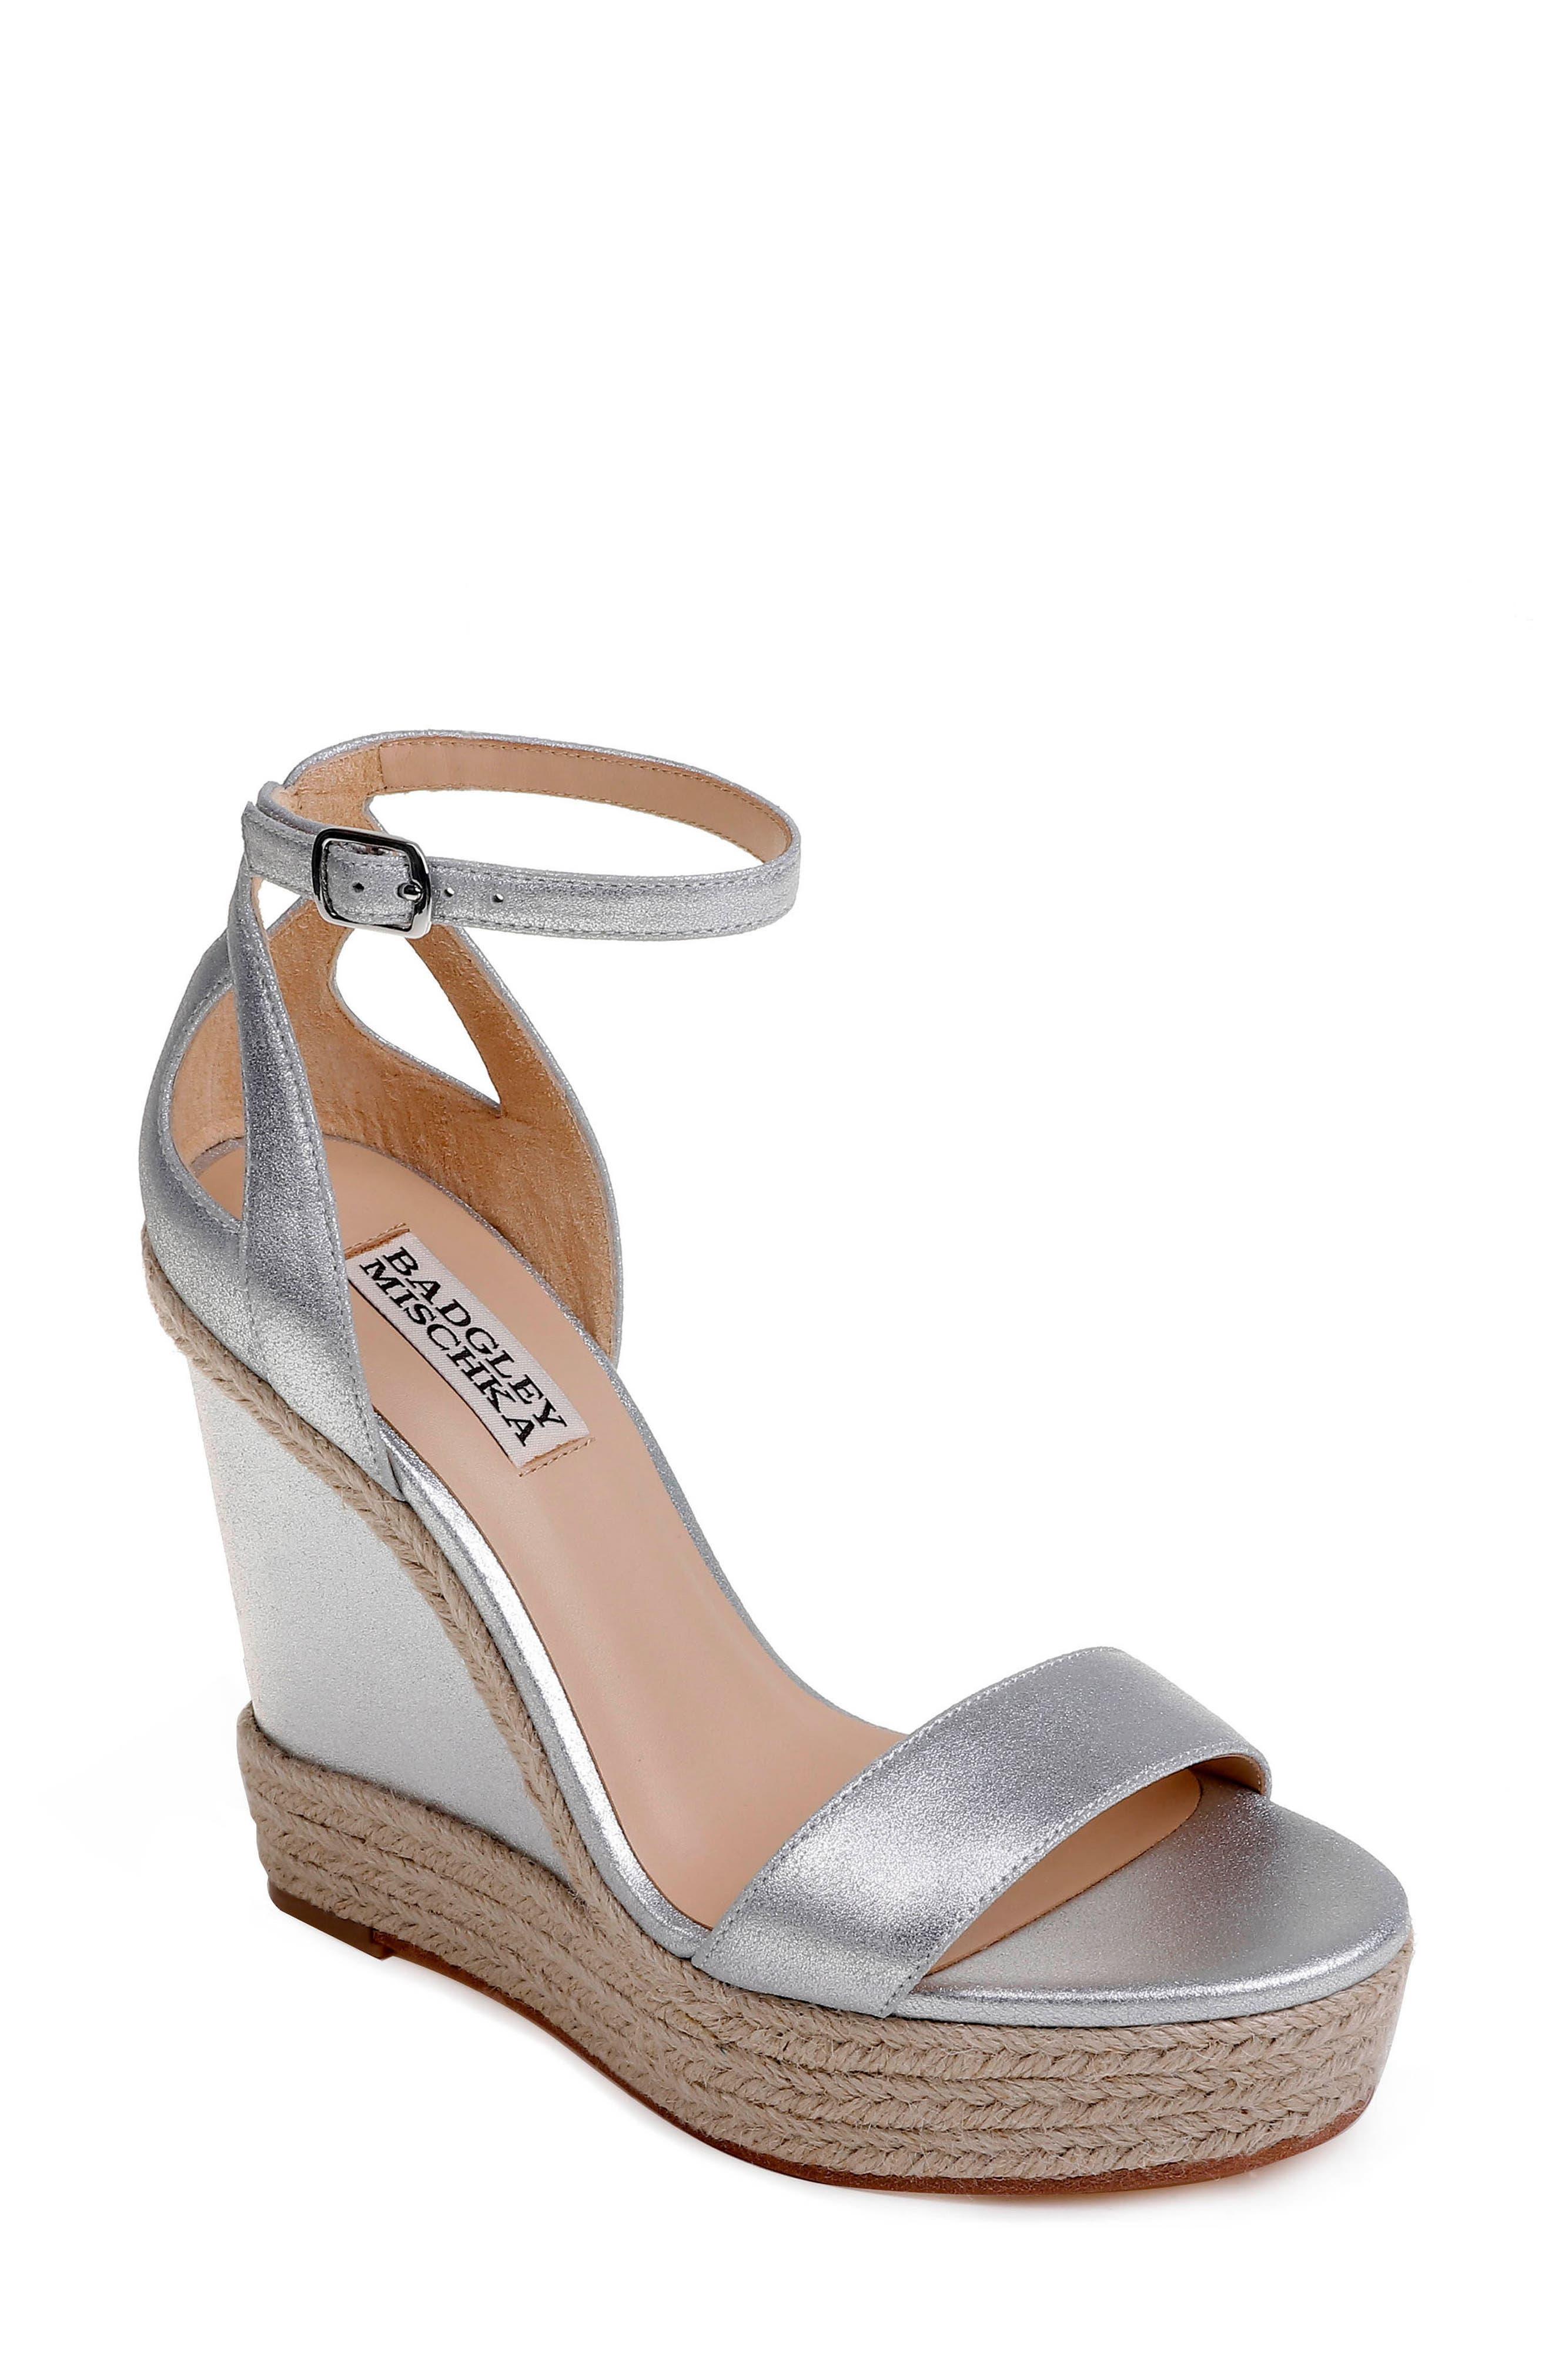 Honest Espadrille Wedge Sandal,                         Main,                         color, Silver Metallic Suede